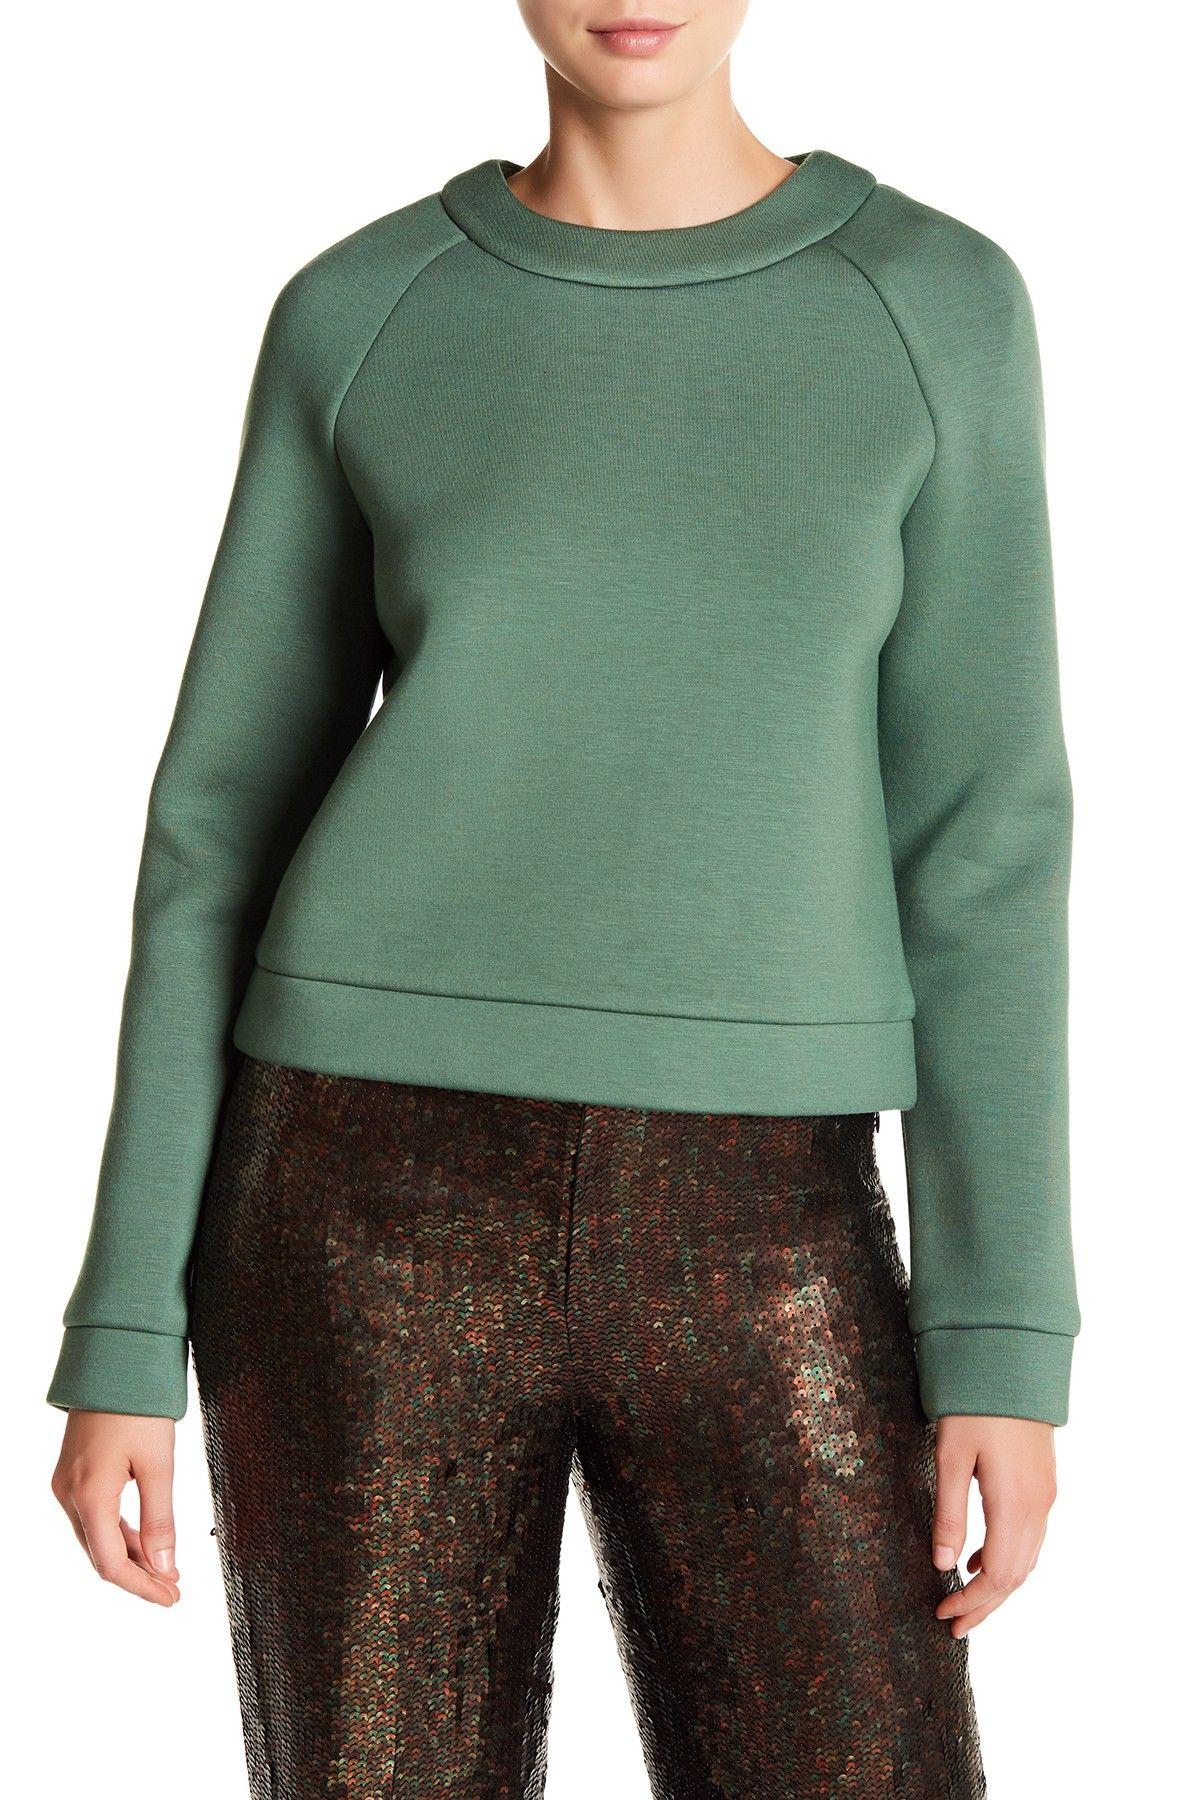 Tibi Marisol Neoprene Sweatshirt Sweatshirts, Ross